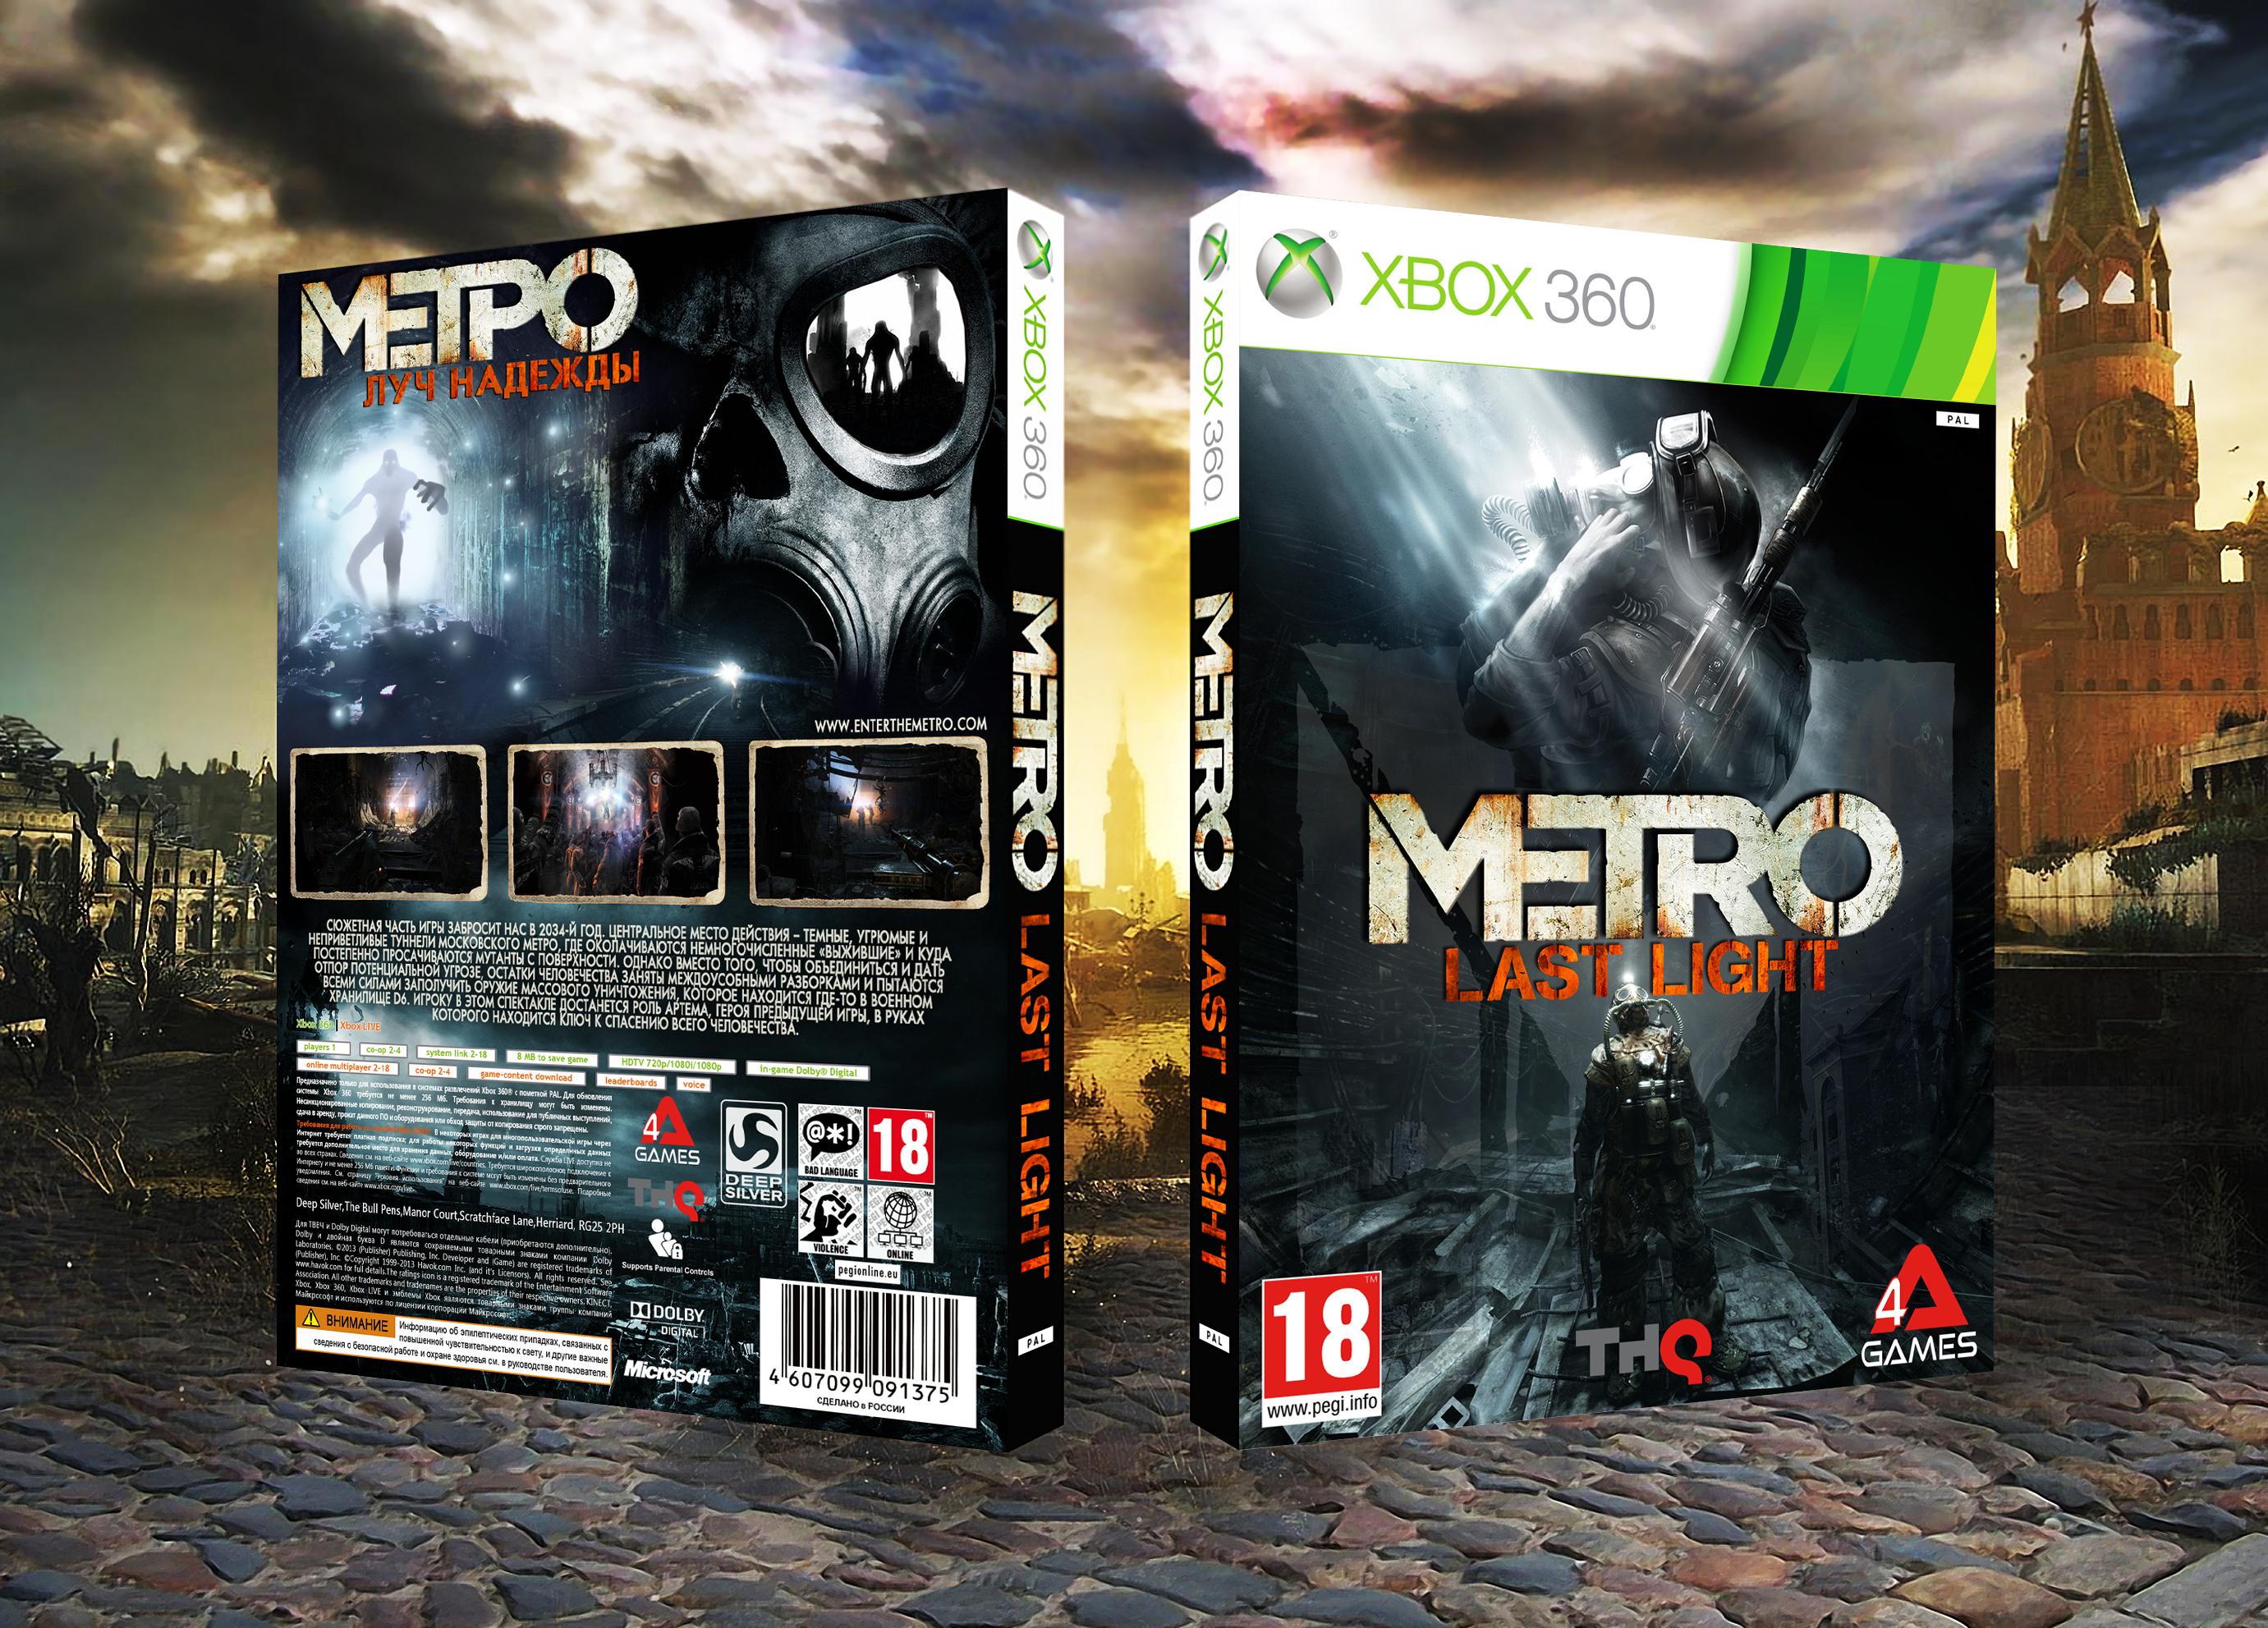 metro  last light xbox 360 box art cover by fergana16